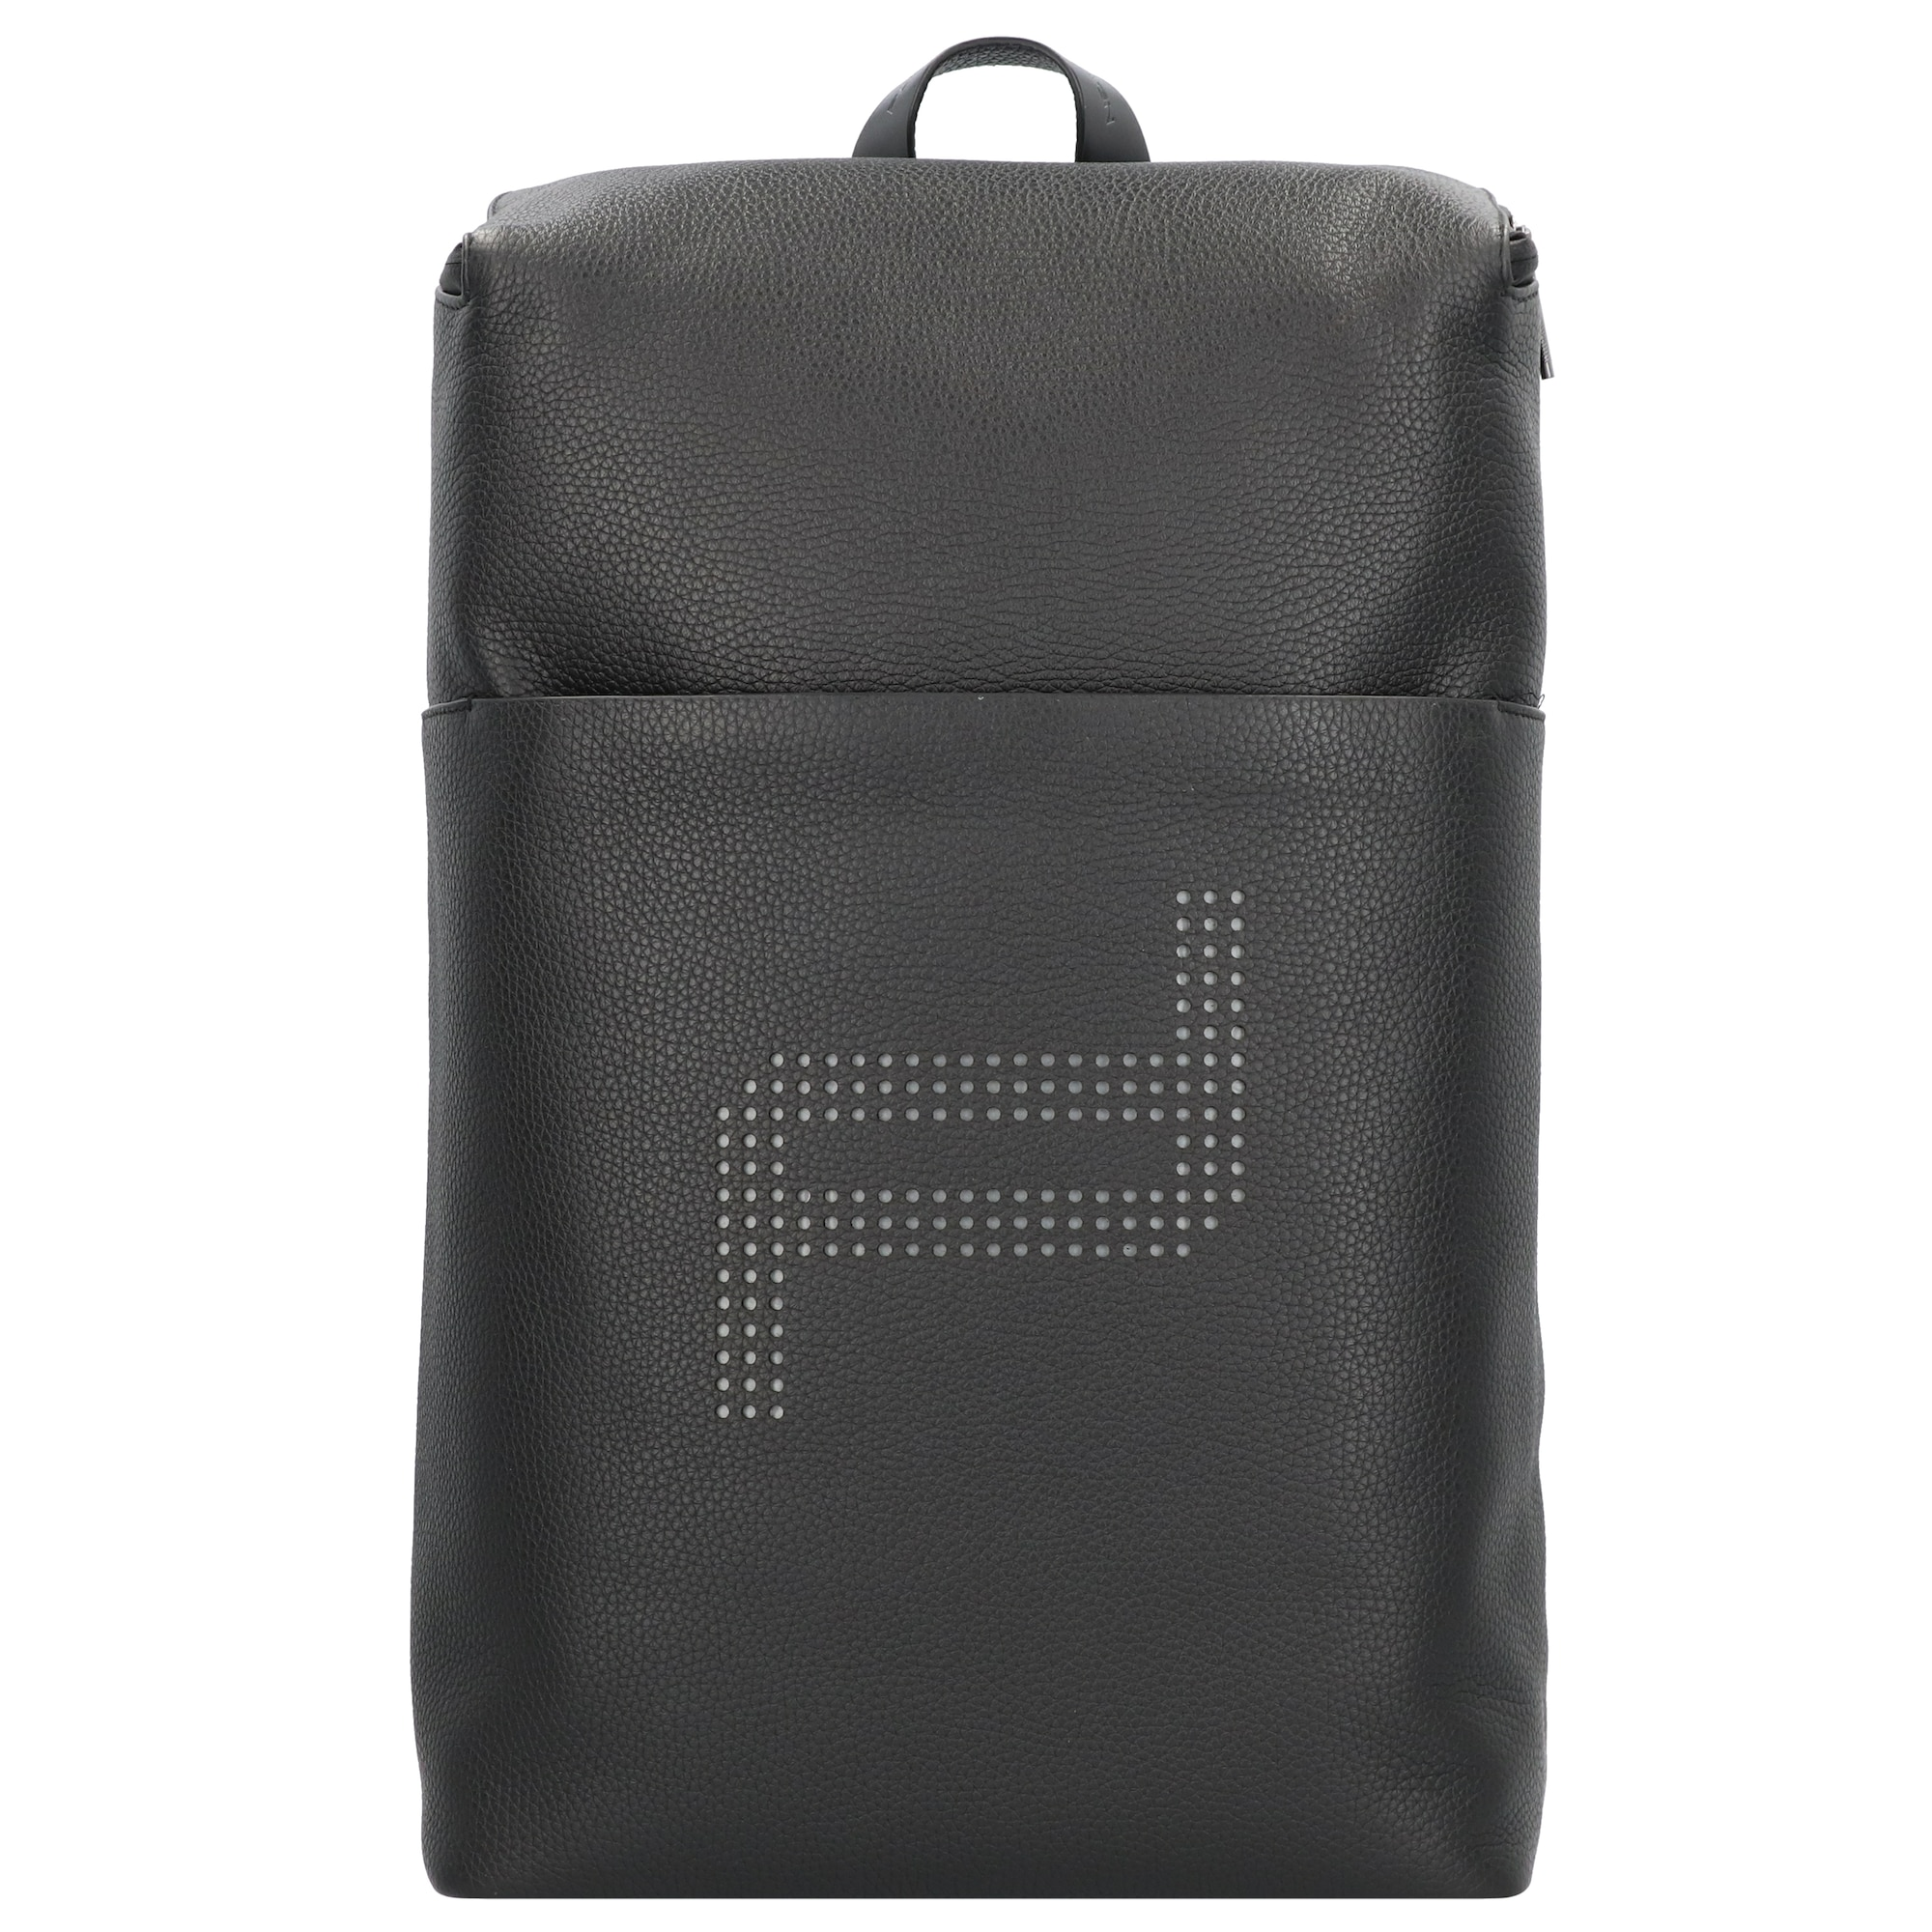 Signature Businessrucksack 45 cm Leder Laptopfach   Taschen > Rucksäcke > Businessrucksäcke   Porsche Design